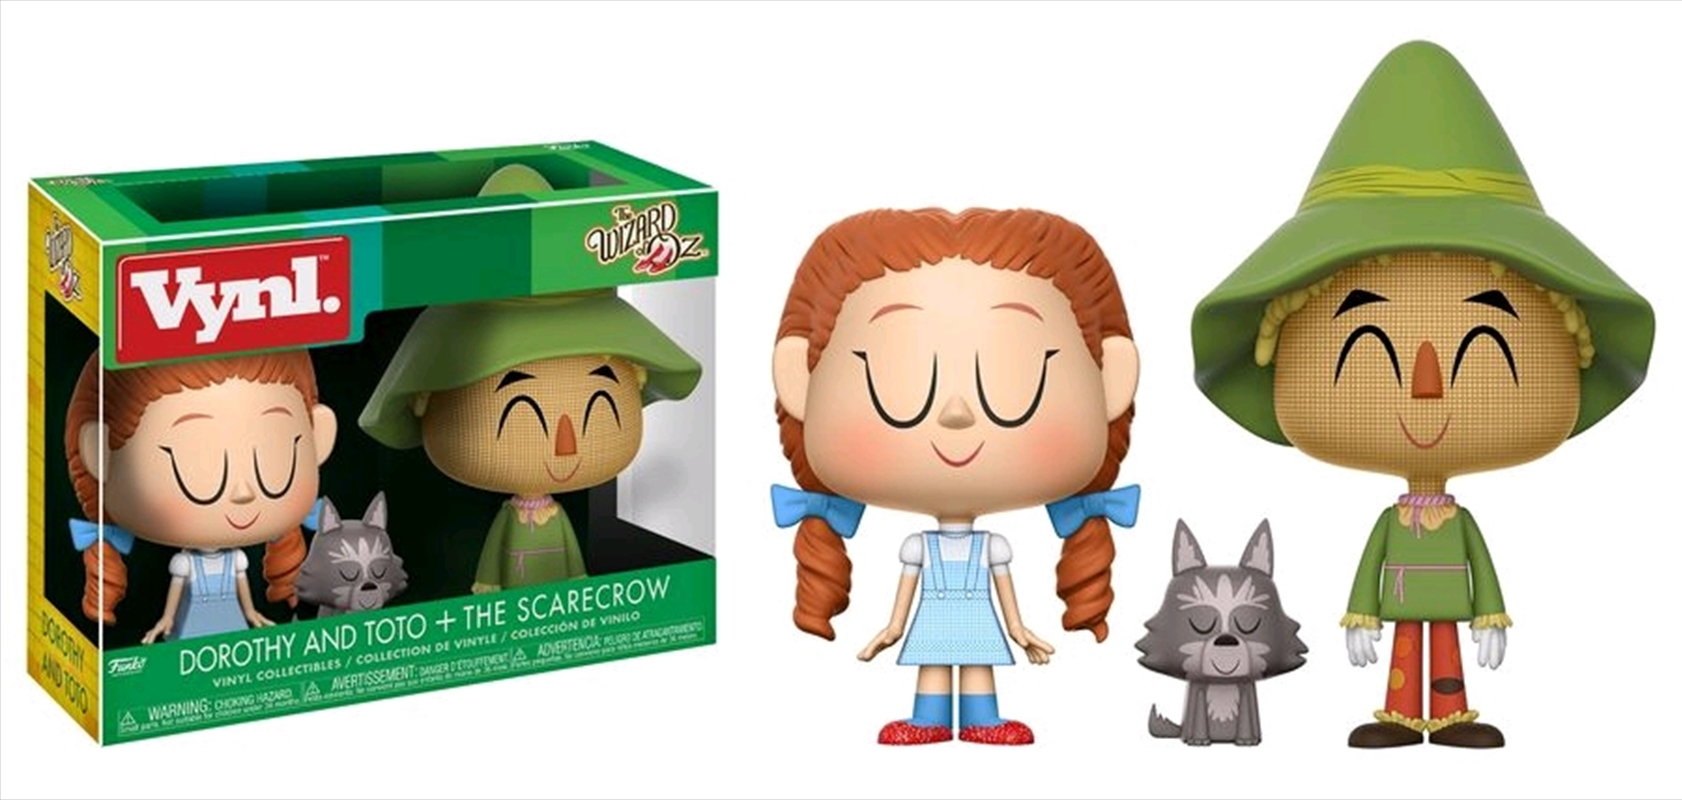 Wizard of Oz - Dorothy & Scarecrow Vynl.   Merchandise